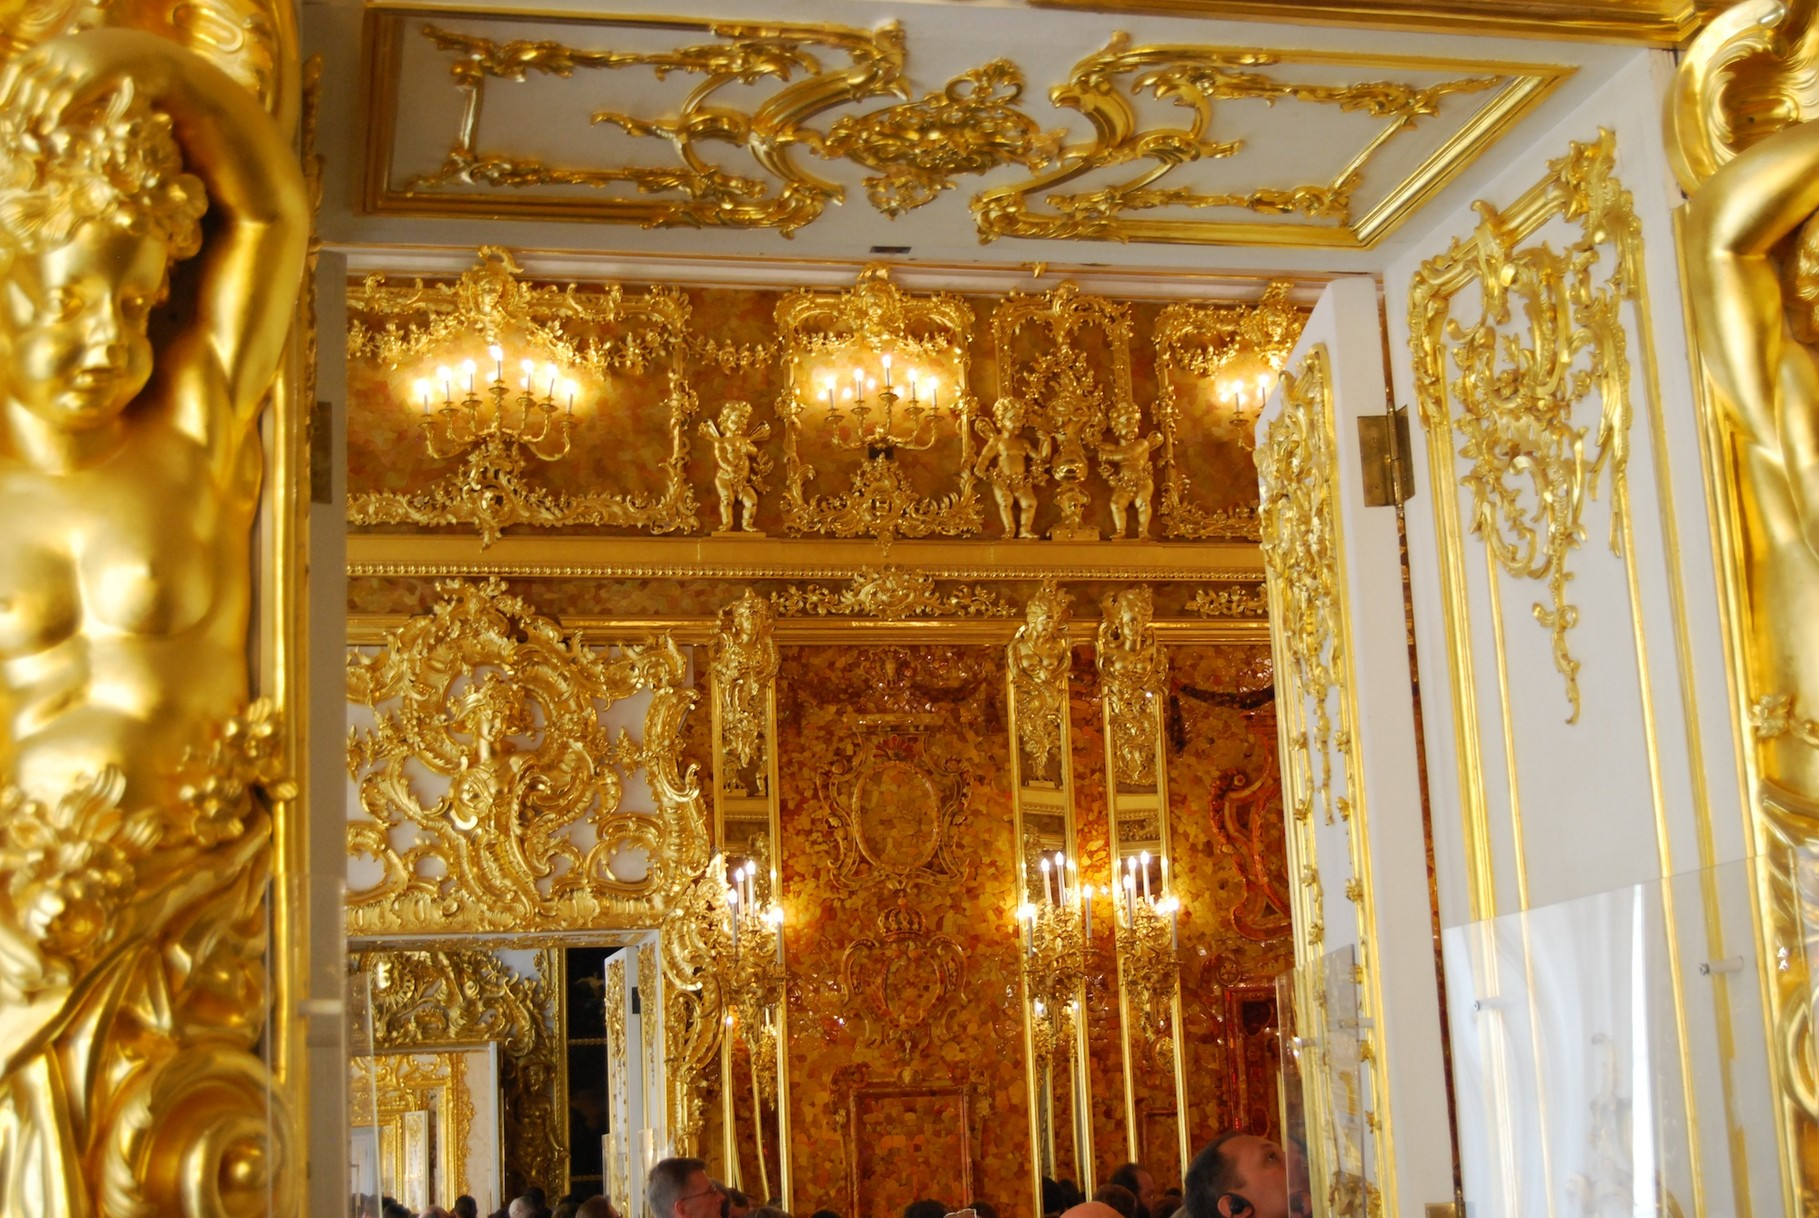 Bernsteinzimmer im Ekaterinenpalast in Pushkin